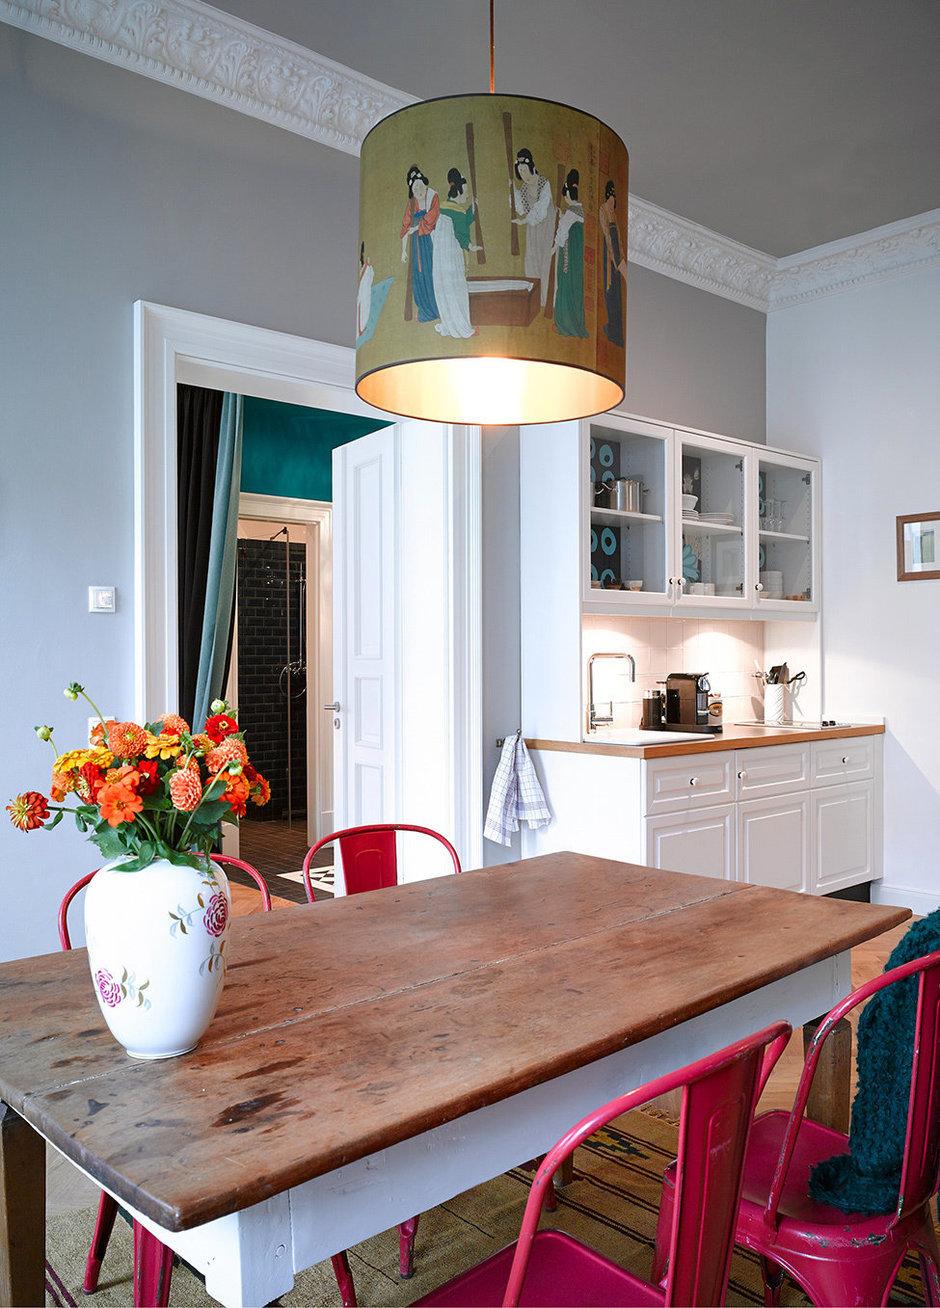 Фотография: Кухня и столовая в стиле Прованс и Кантри, Квартира, Германия, Дома и квартиры – фото на InMyRoom.ru